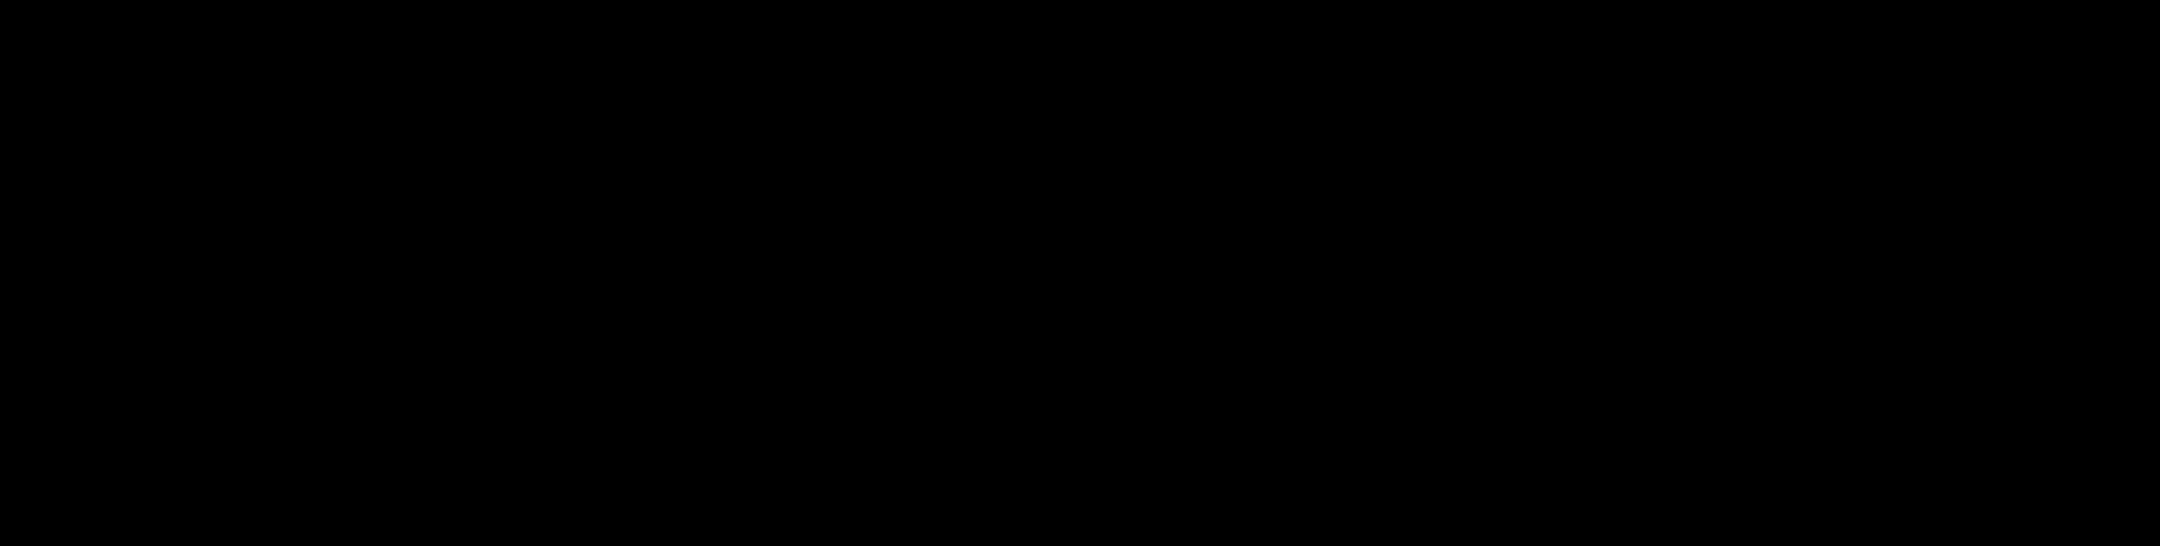 lvmh logo 1 - LVMH Logo